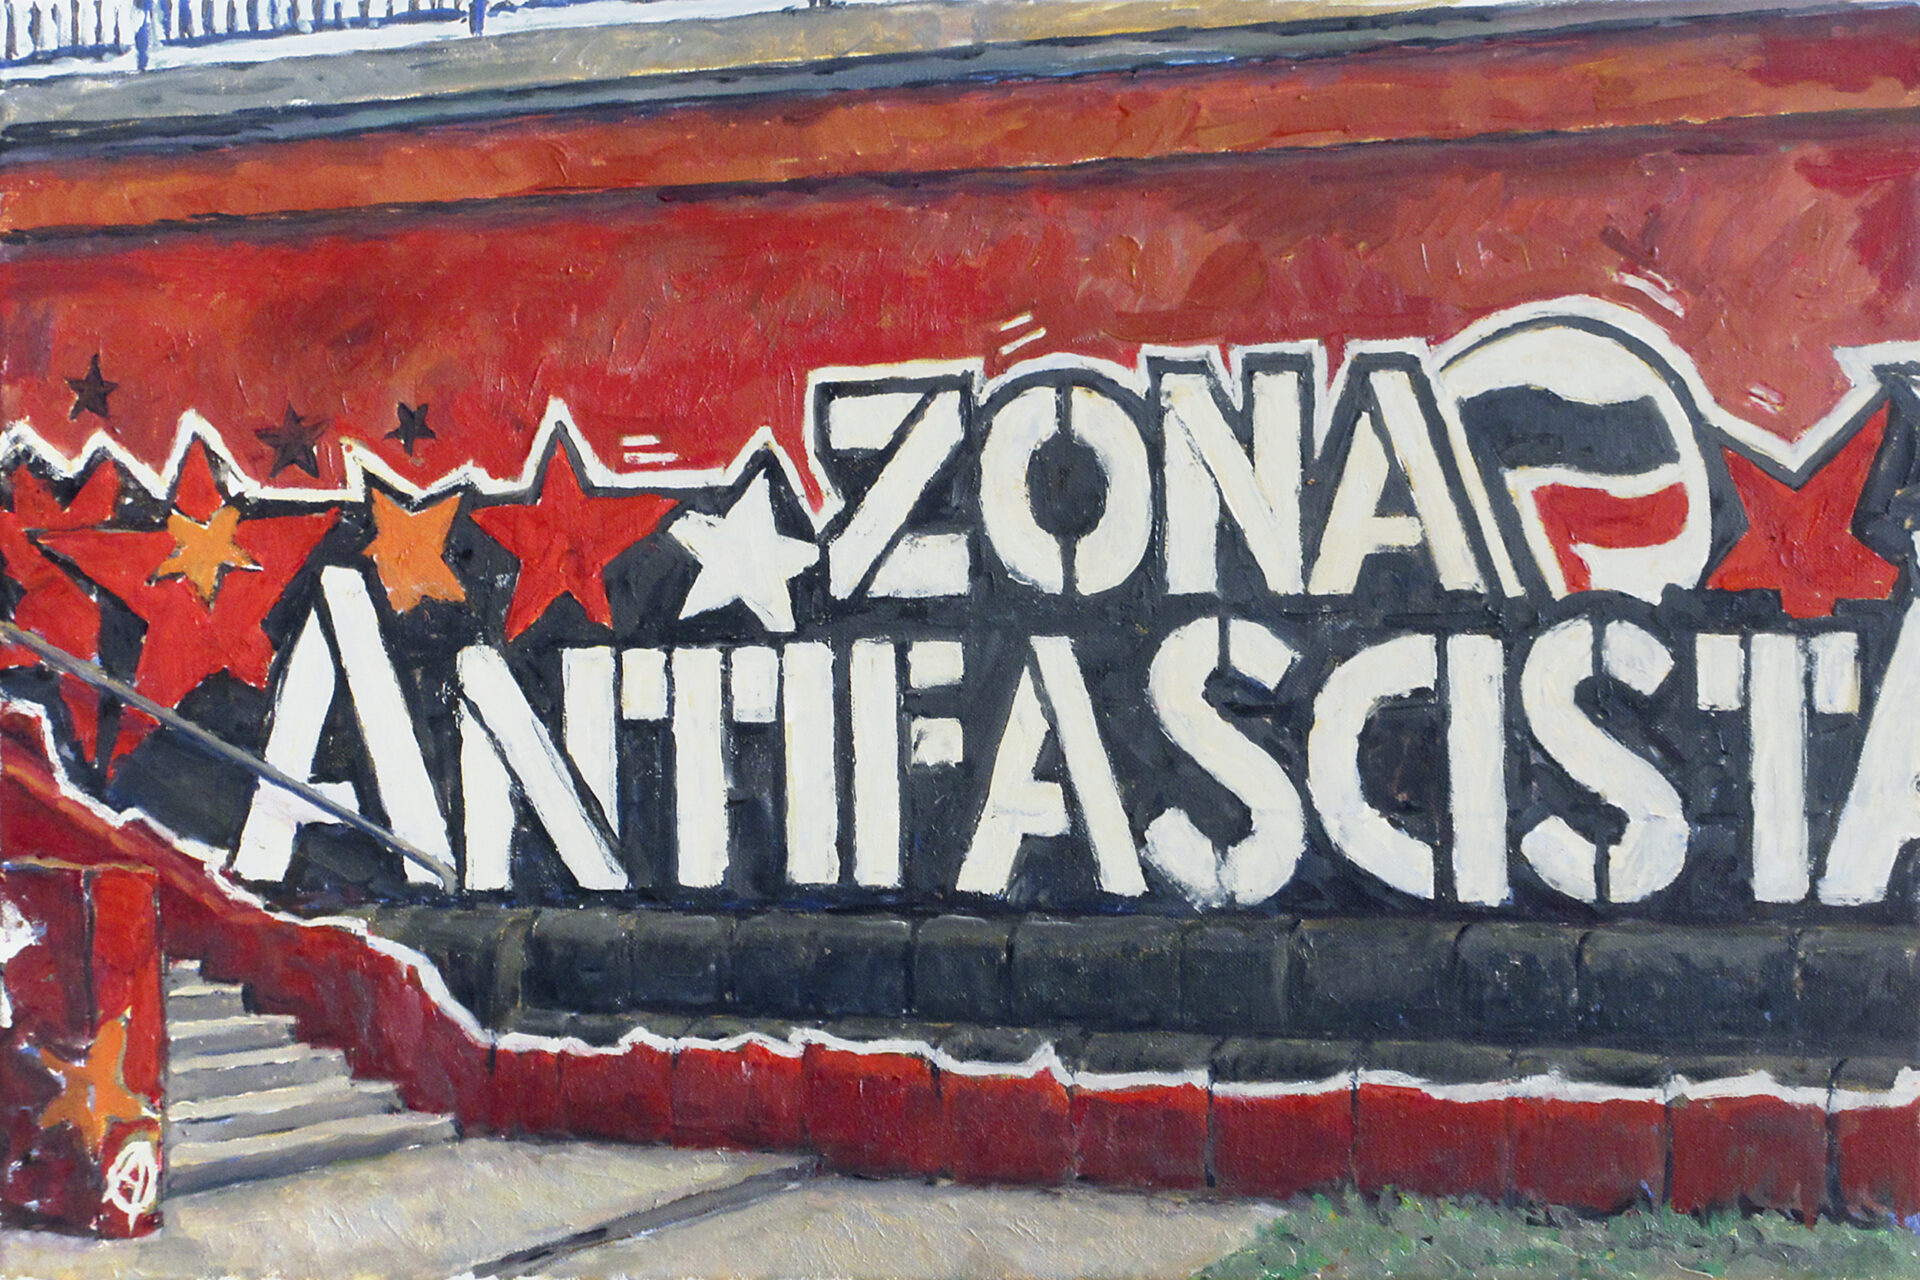 Wien Donaukanal, Zona Antifascista